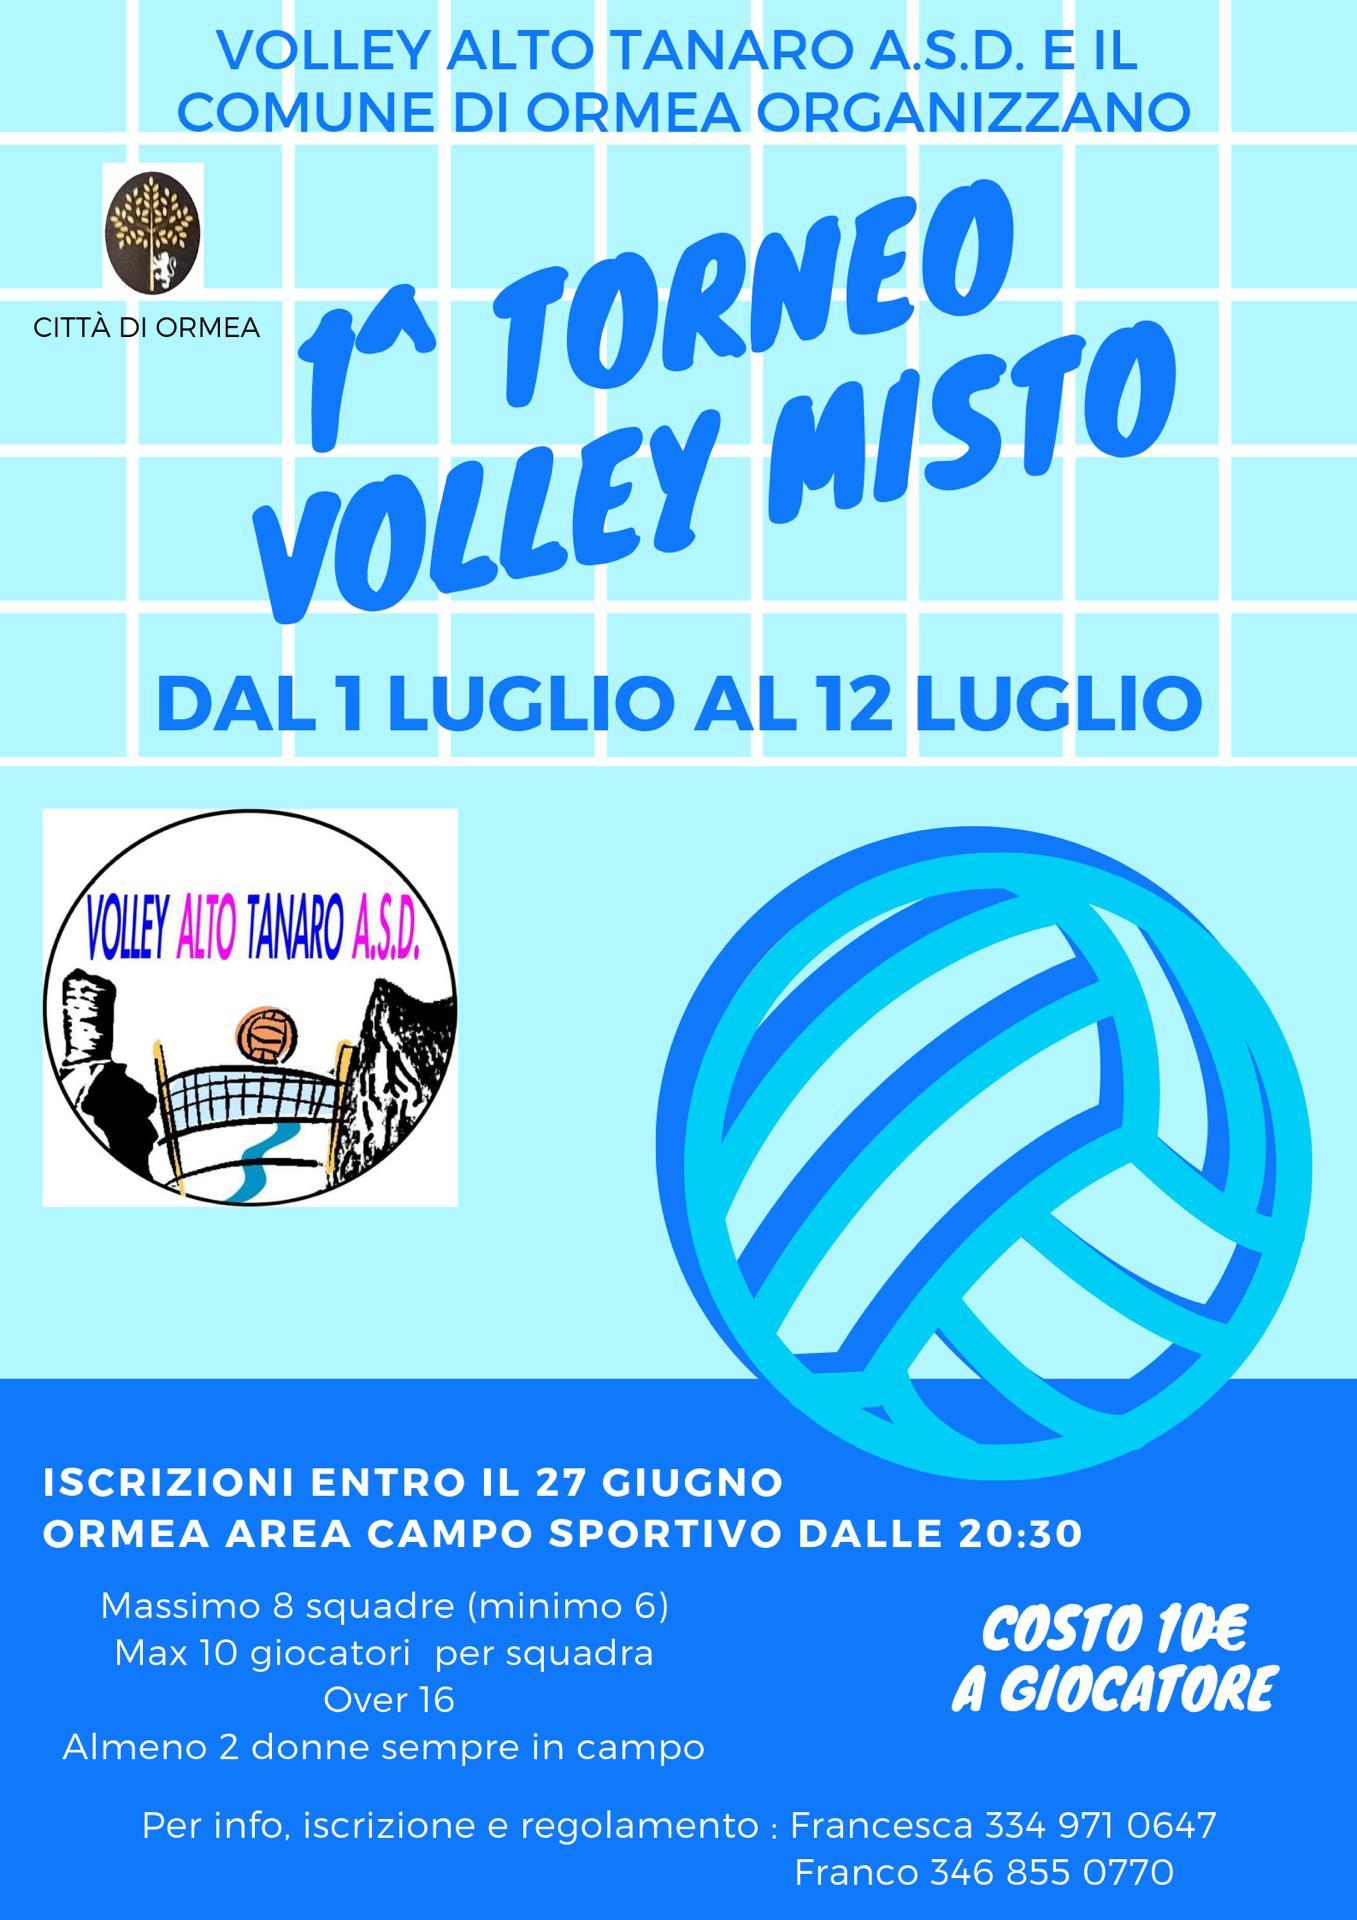 ORMEA: Torneo volley misto 2019